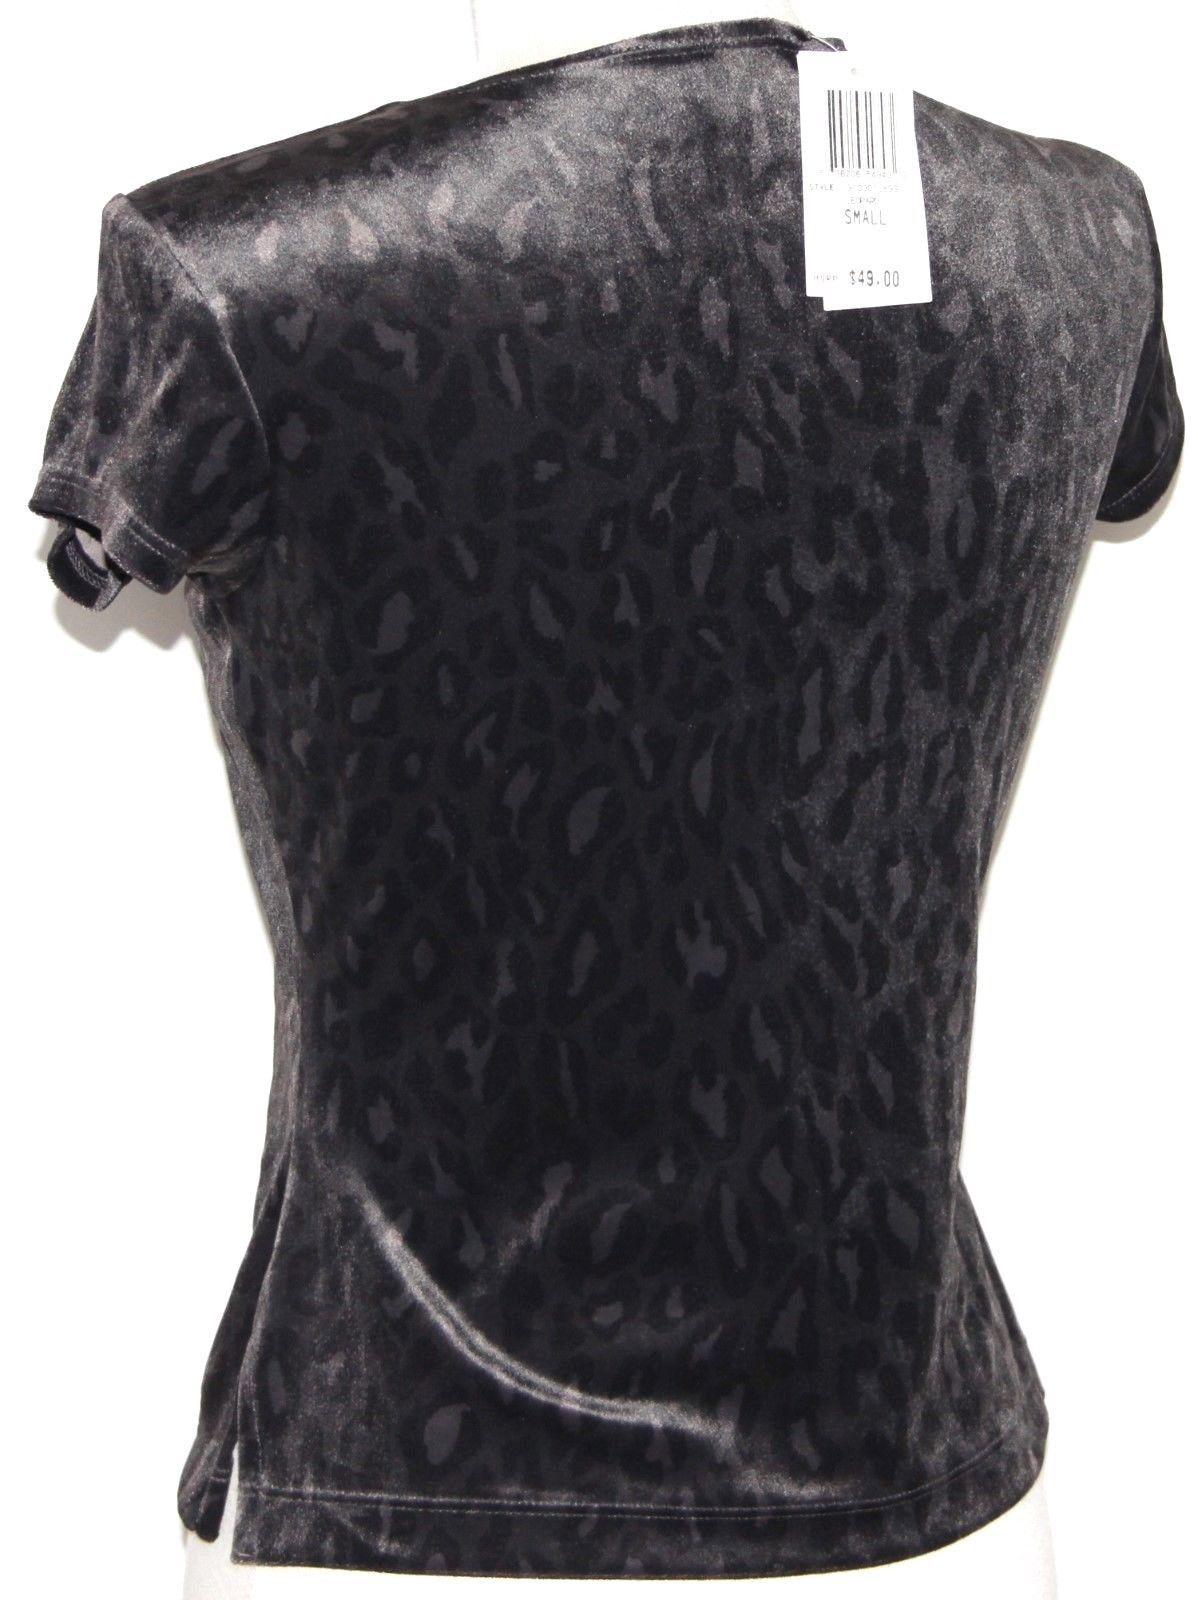 S INC Ladies Gothic Emo Goth Rockabilly Velvety Leopard Print Shirt Blouse Top